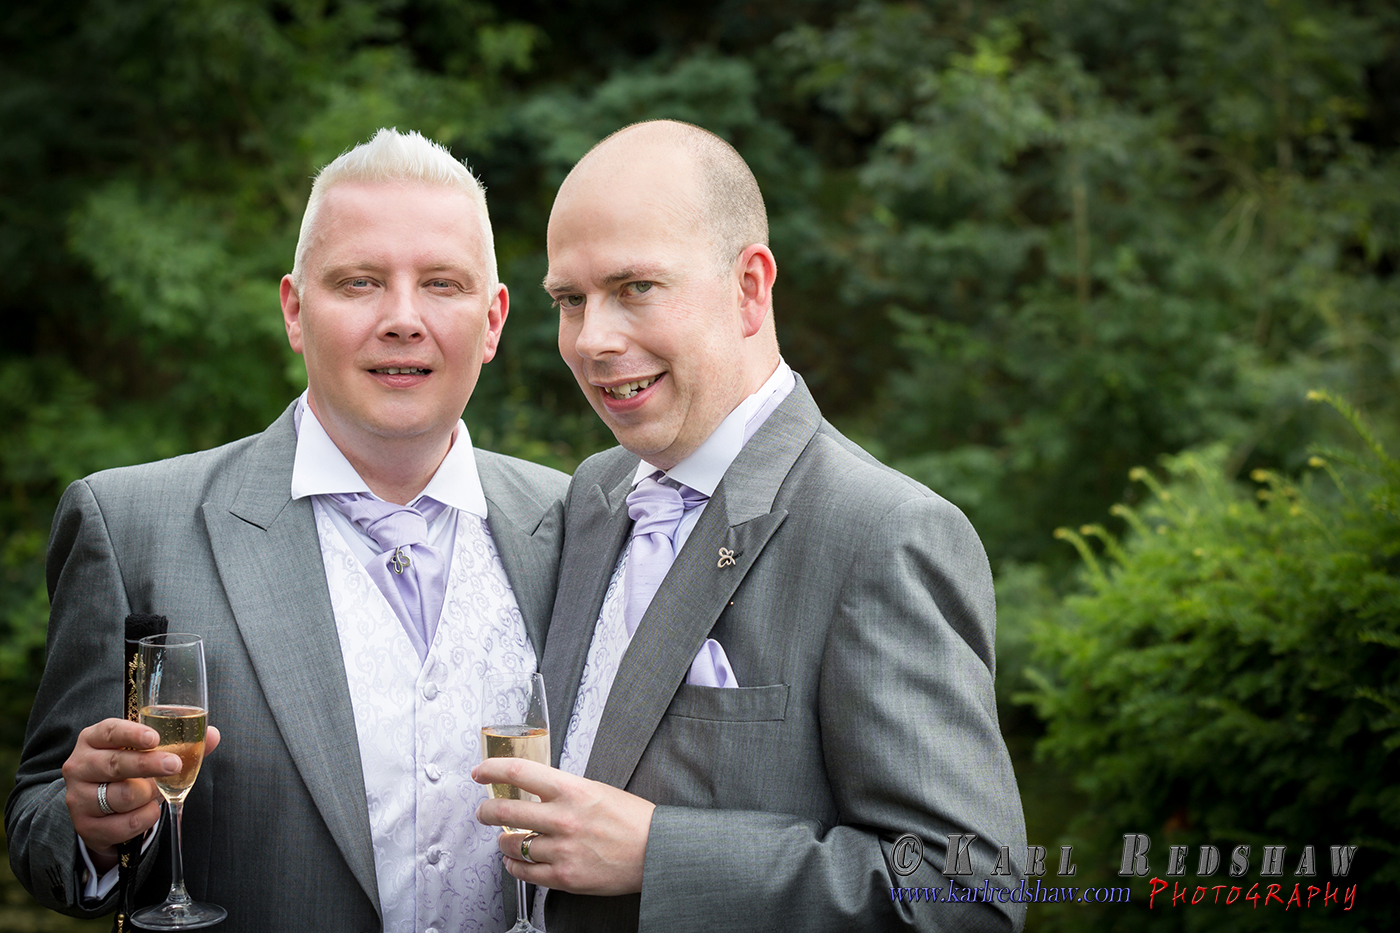 Coombe Abbey Wedding Photographer 1.jpg